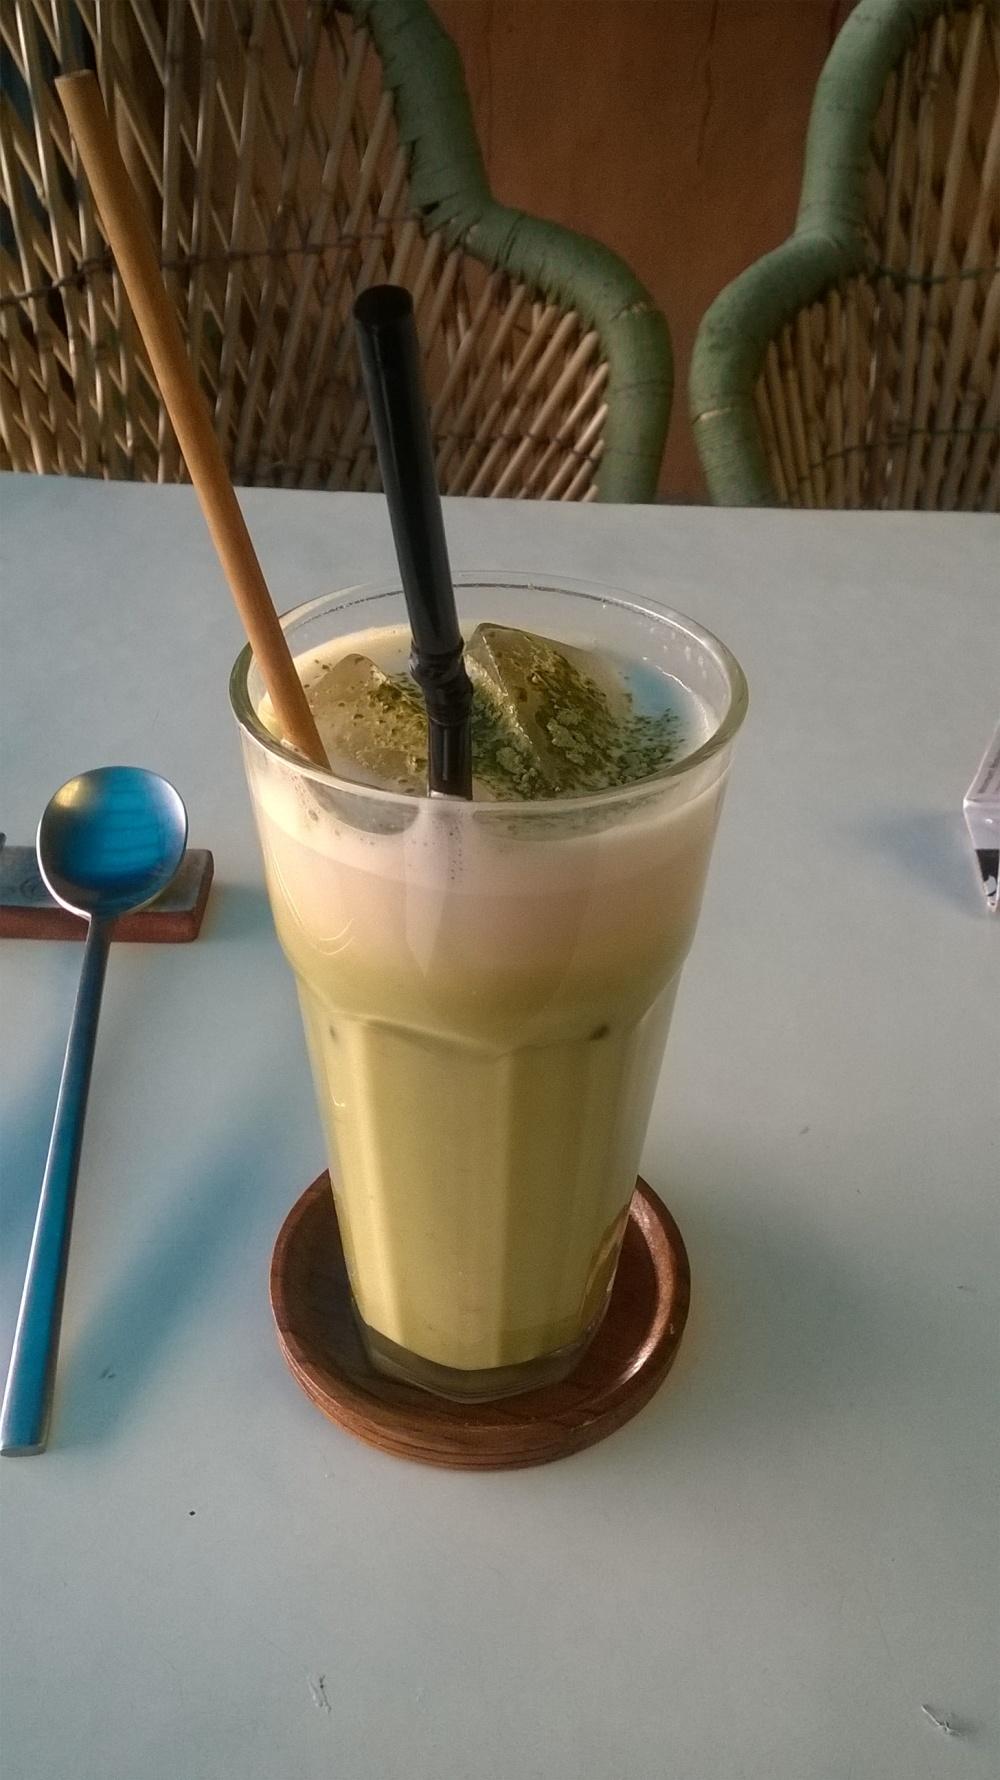 matcha_green_tea_zielona_herbata_ri_korean_dharamsala_latte_matcha_sojowe